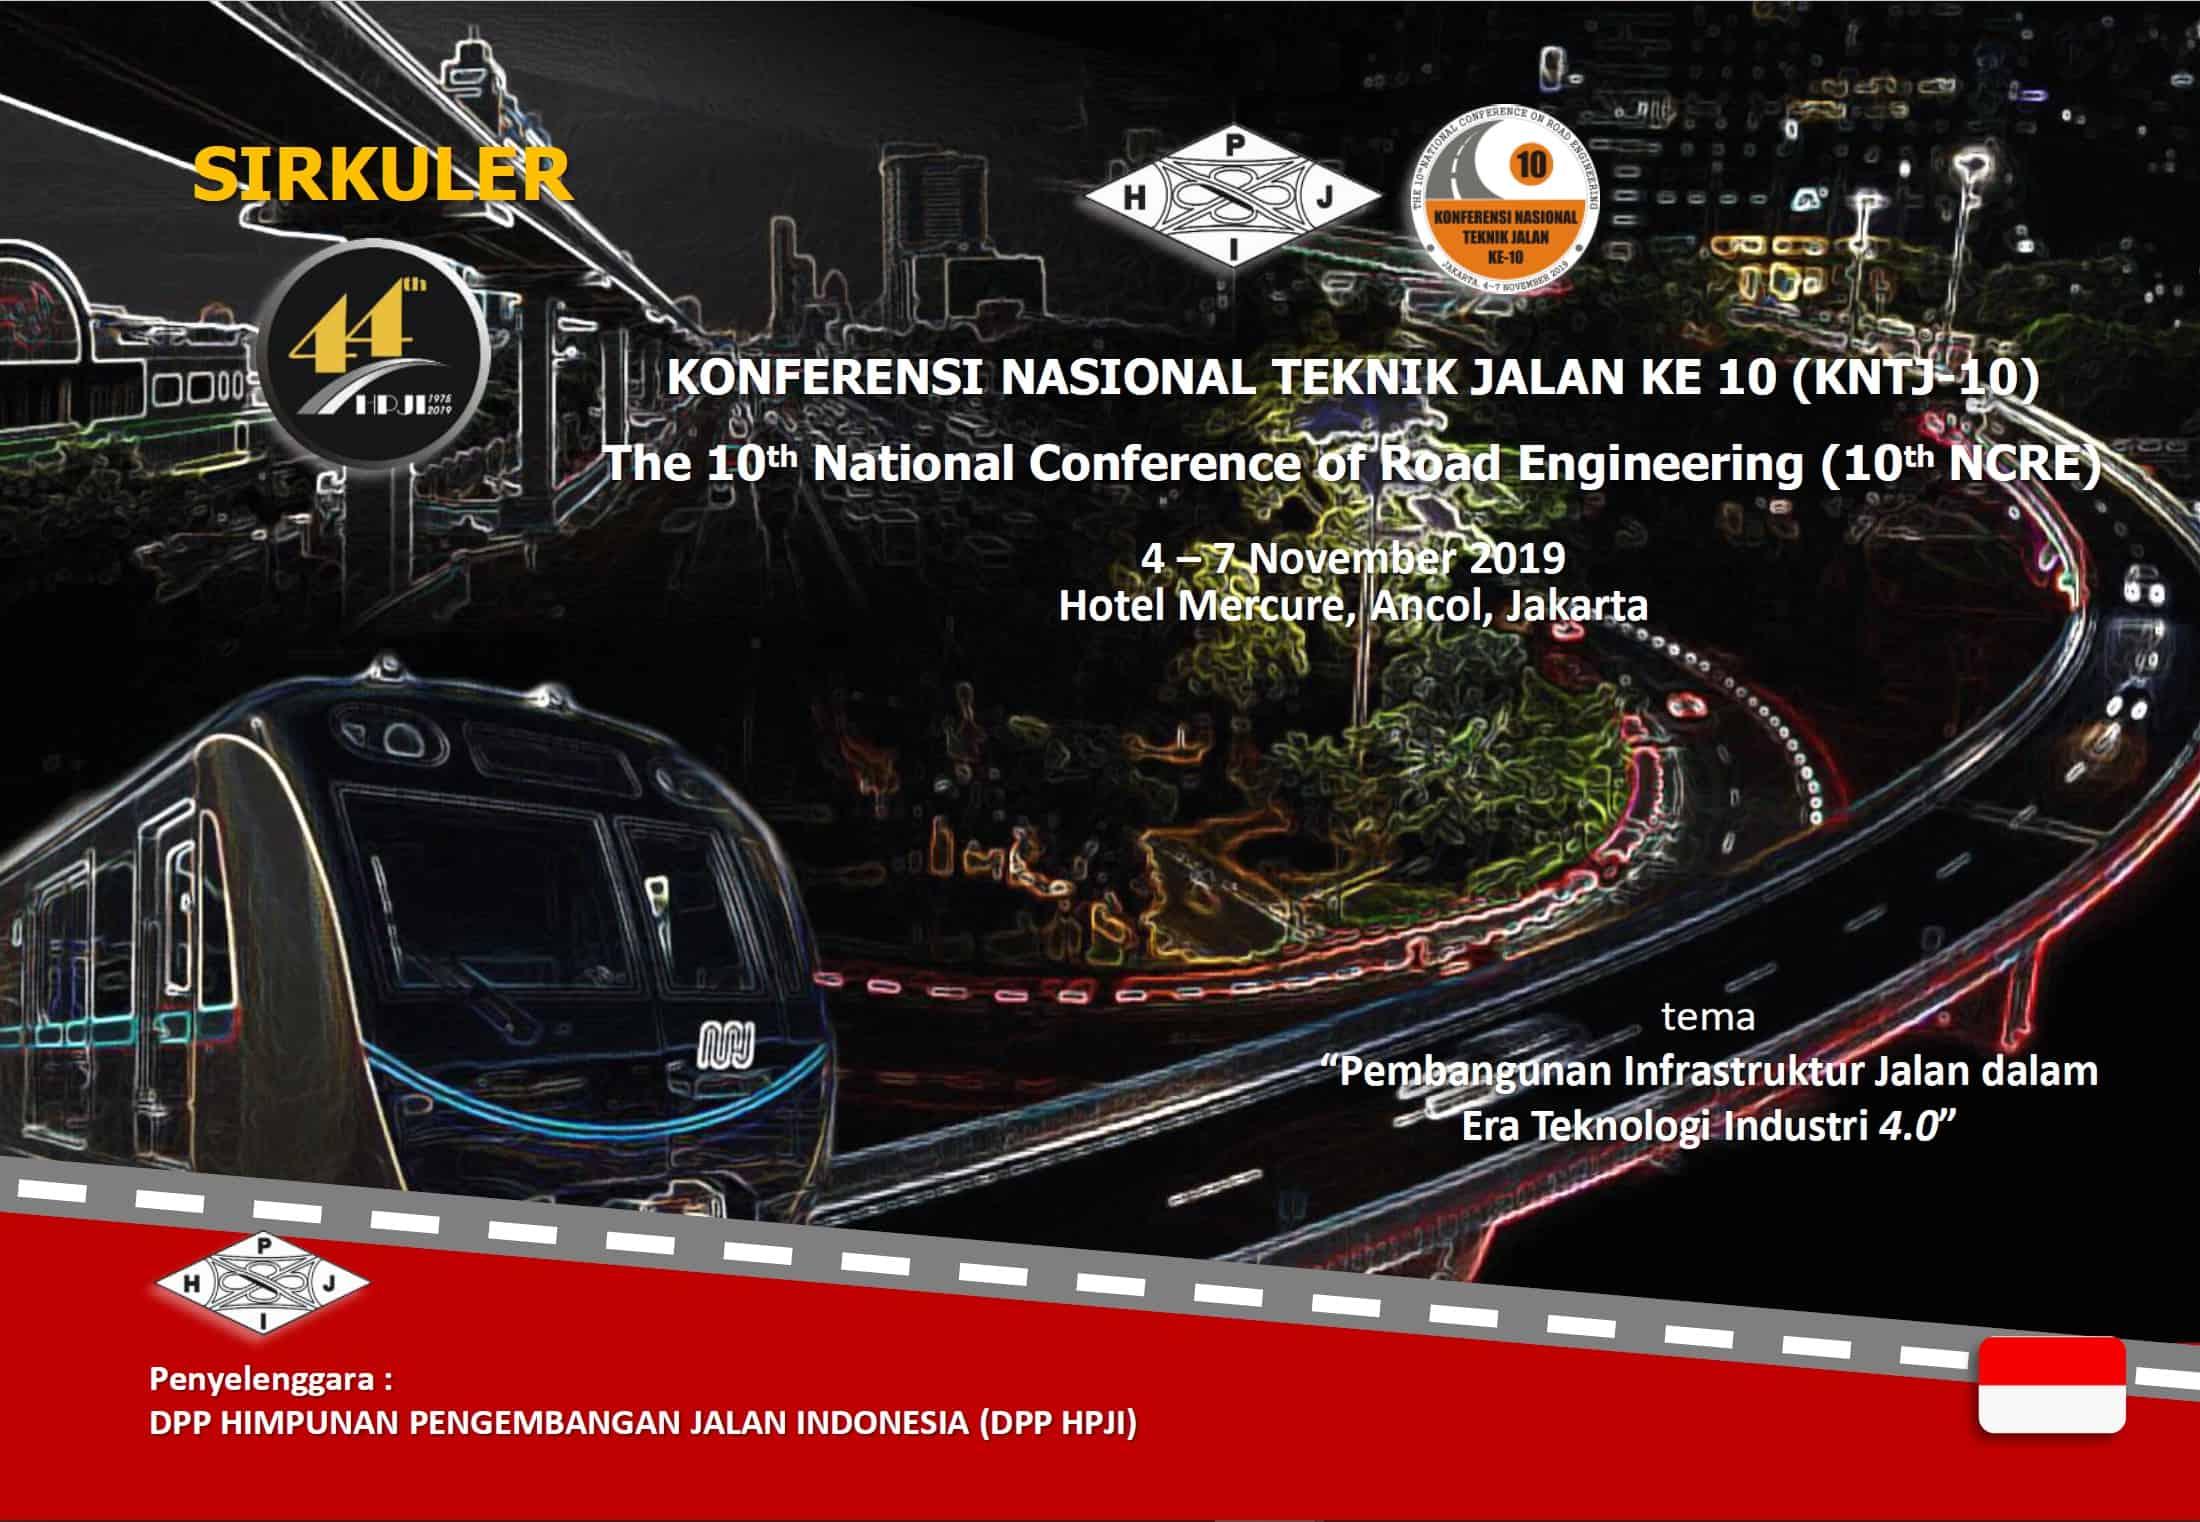 Konferensi Nasional Teknik Jalan ke-10 (KNTJ 10)